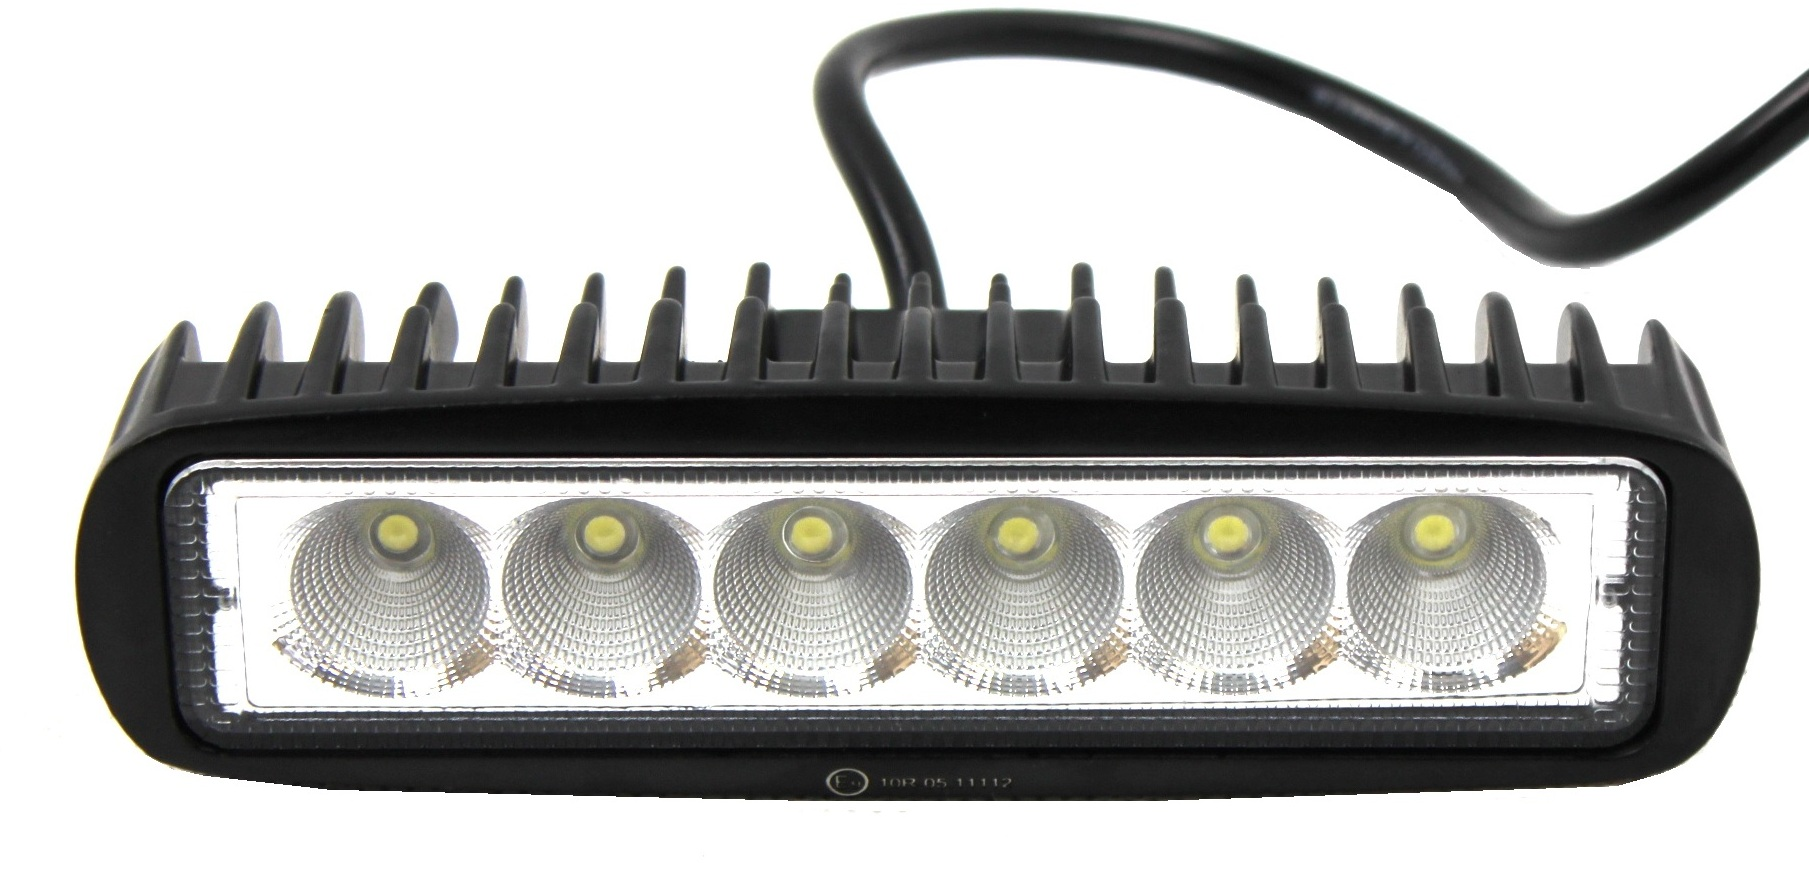 лампа рабочая 6 led панель диффузное 18w ce homol